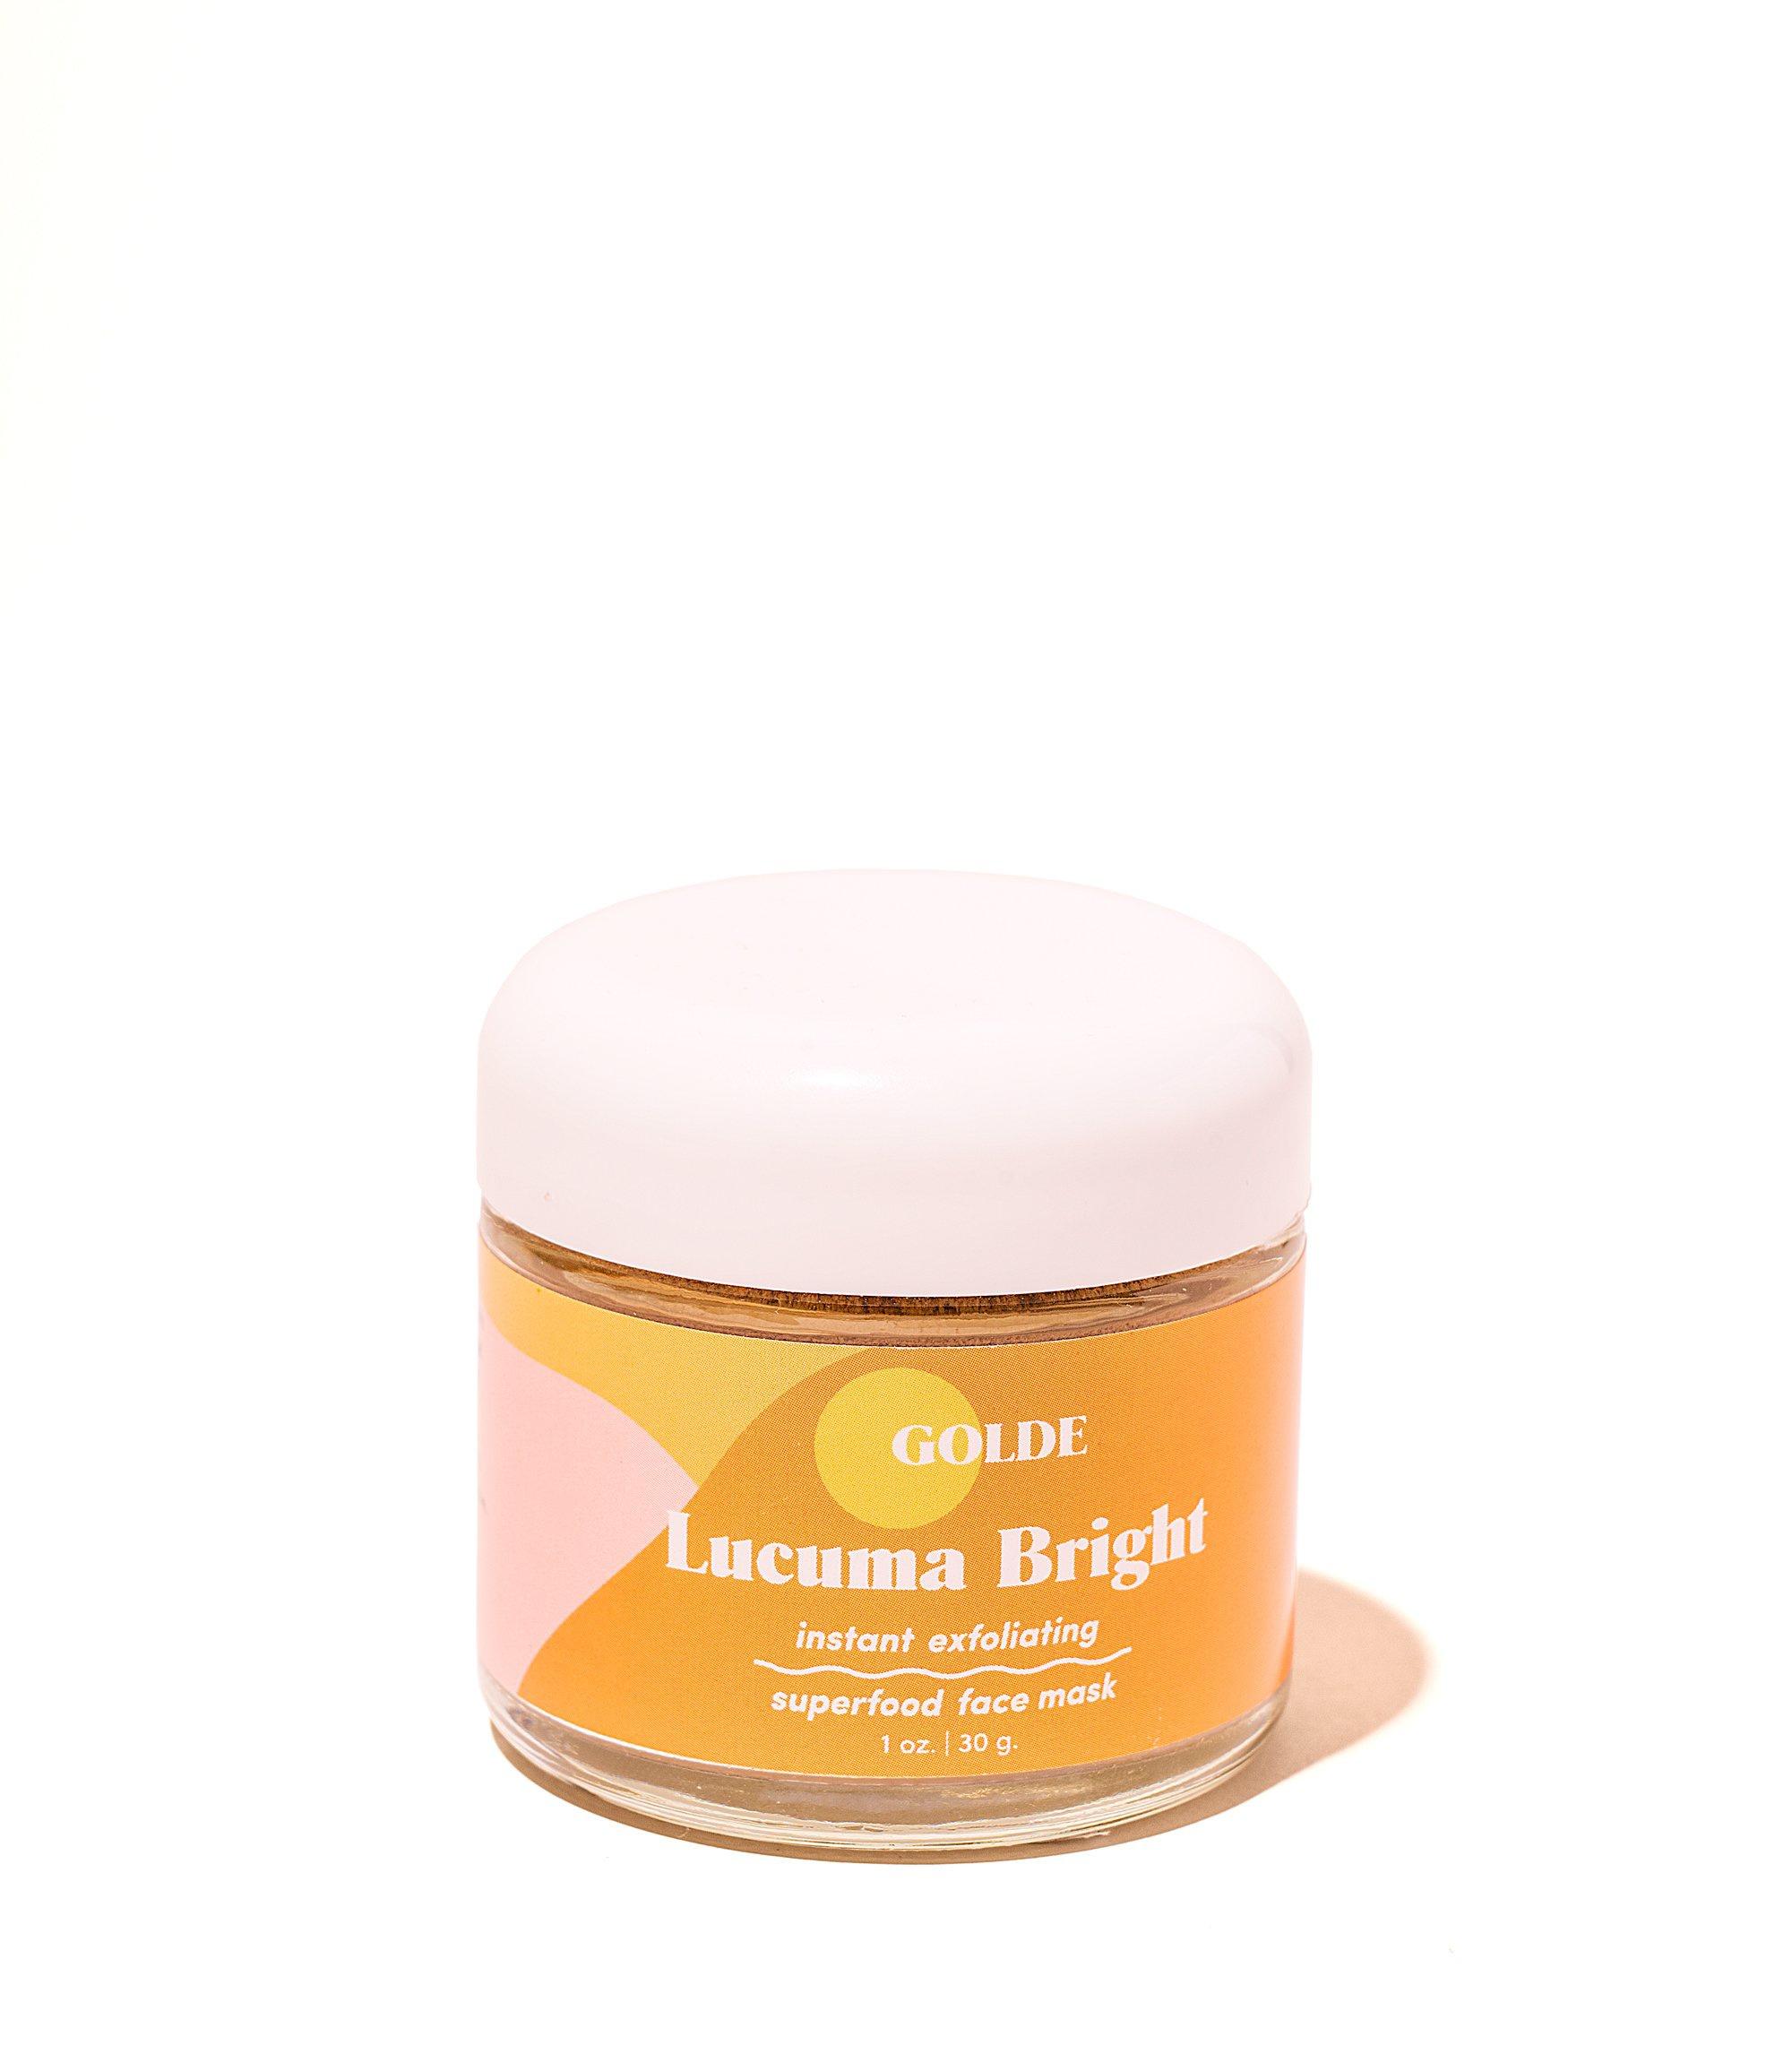 Golde Lucuma Bright Face Mask